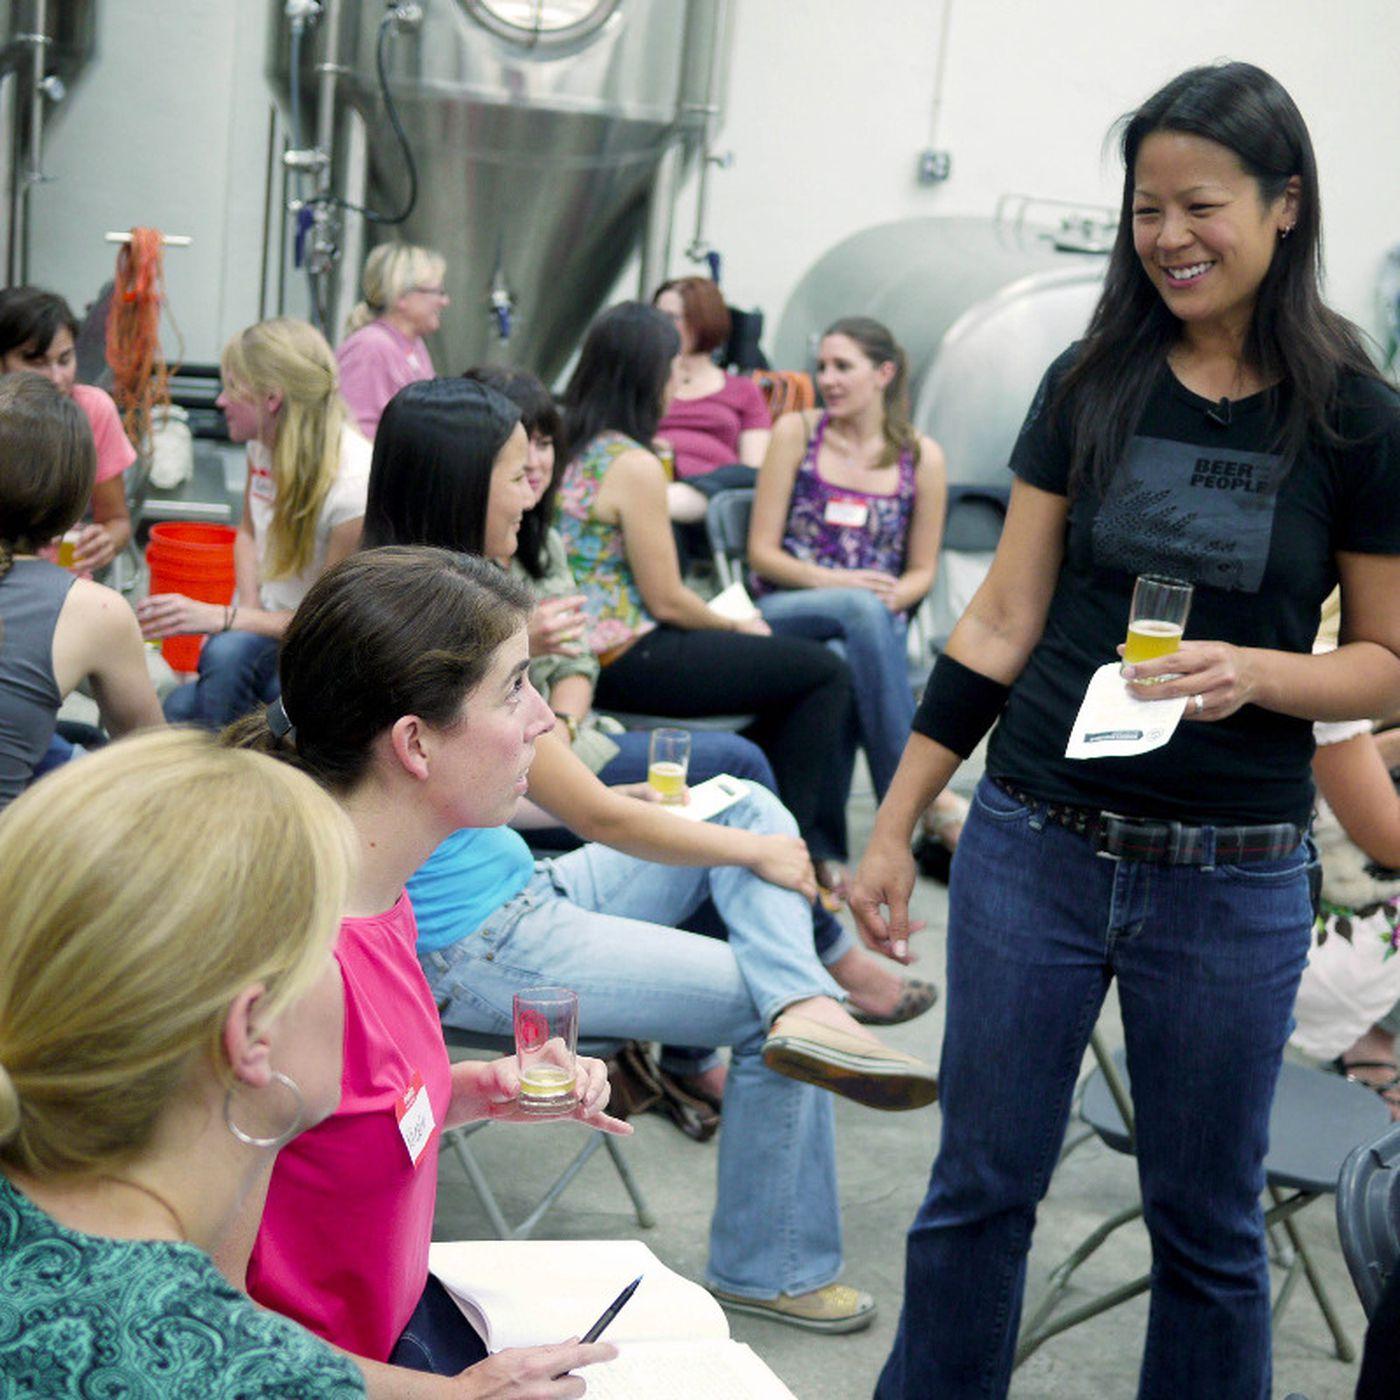 Men's rights activist sues Eagle Rock Brewery women's event